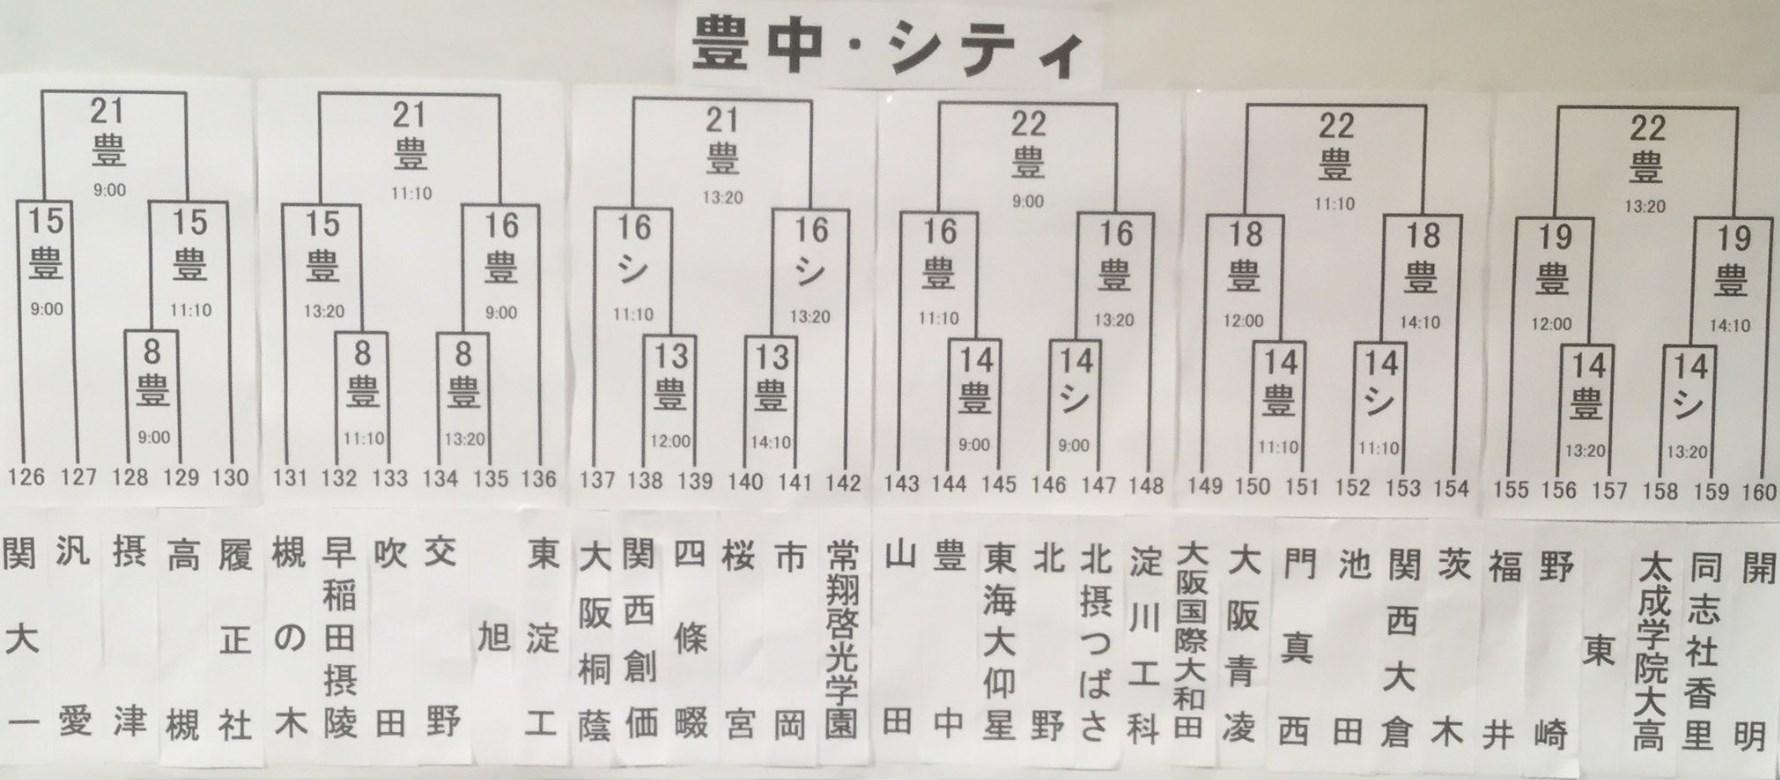 夏の高校野球2018年南大阪大会豊中シティ球場